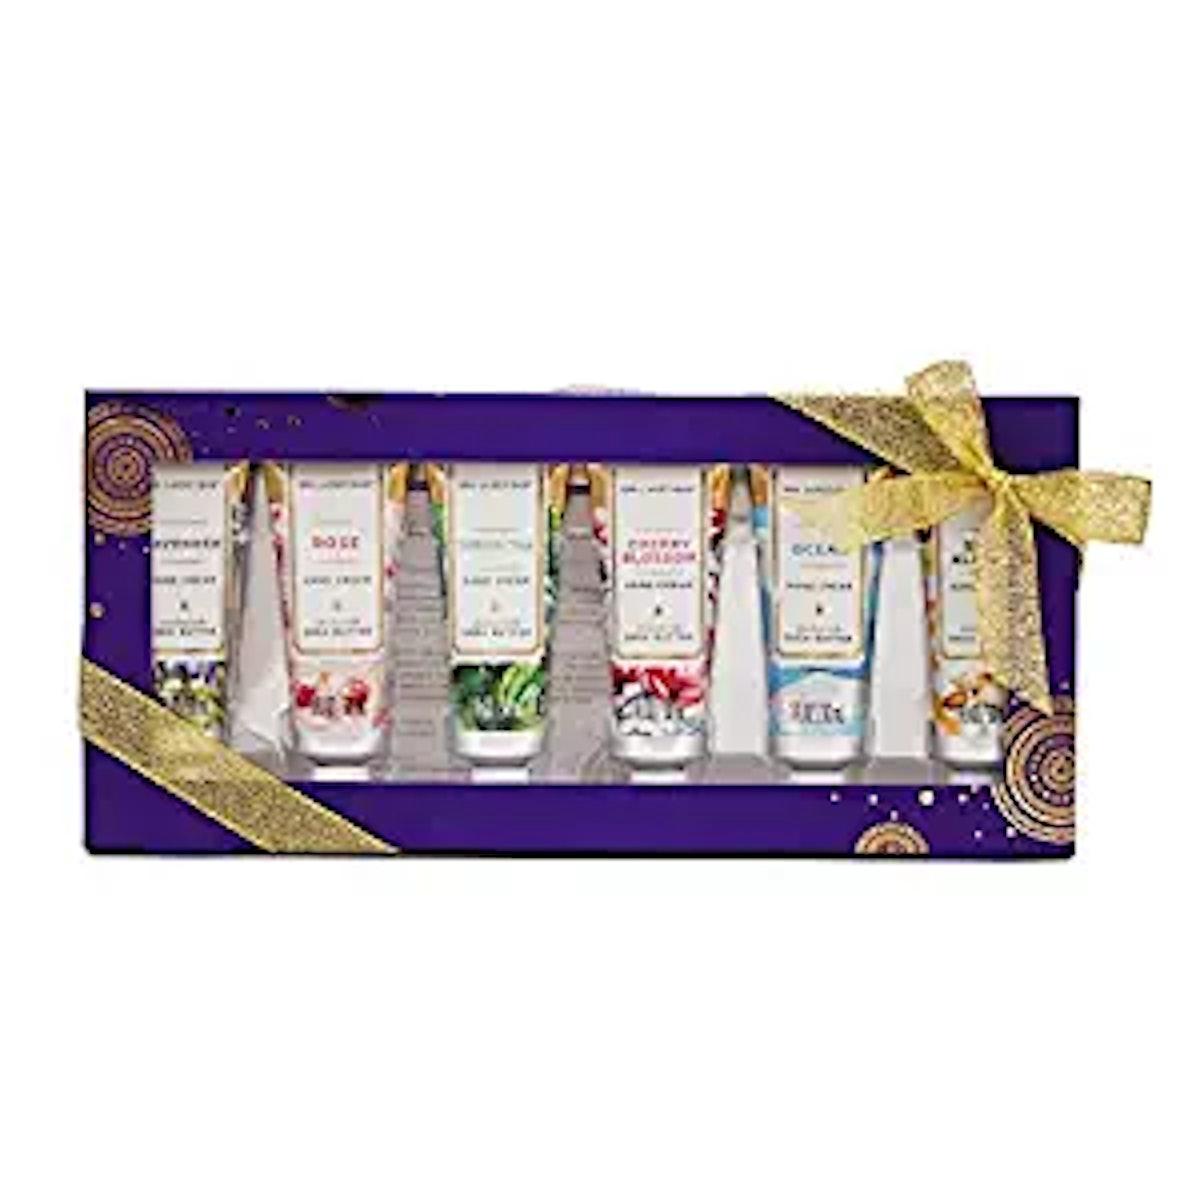 Spa Luxetique Shea Butter Hand Cream Gift Set